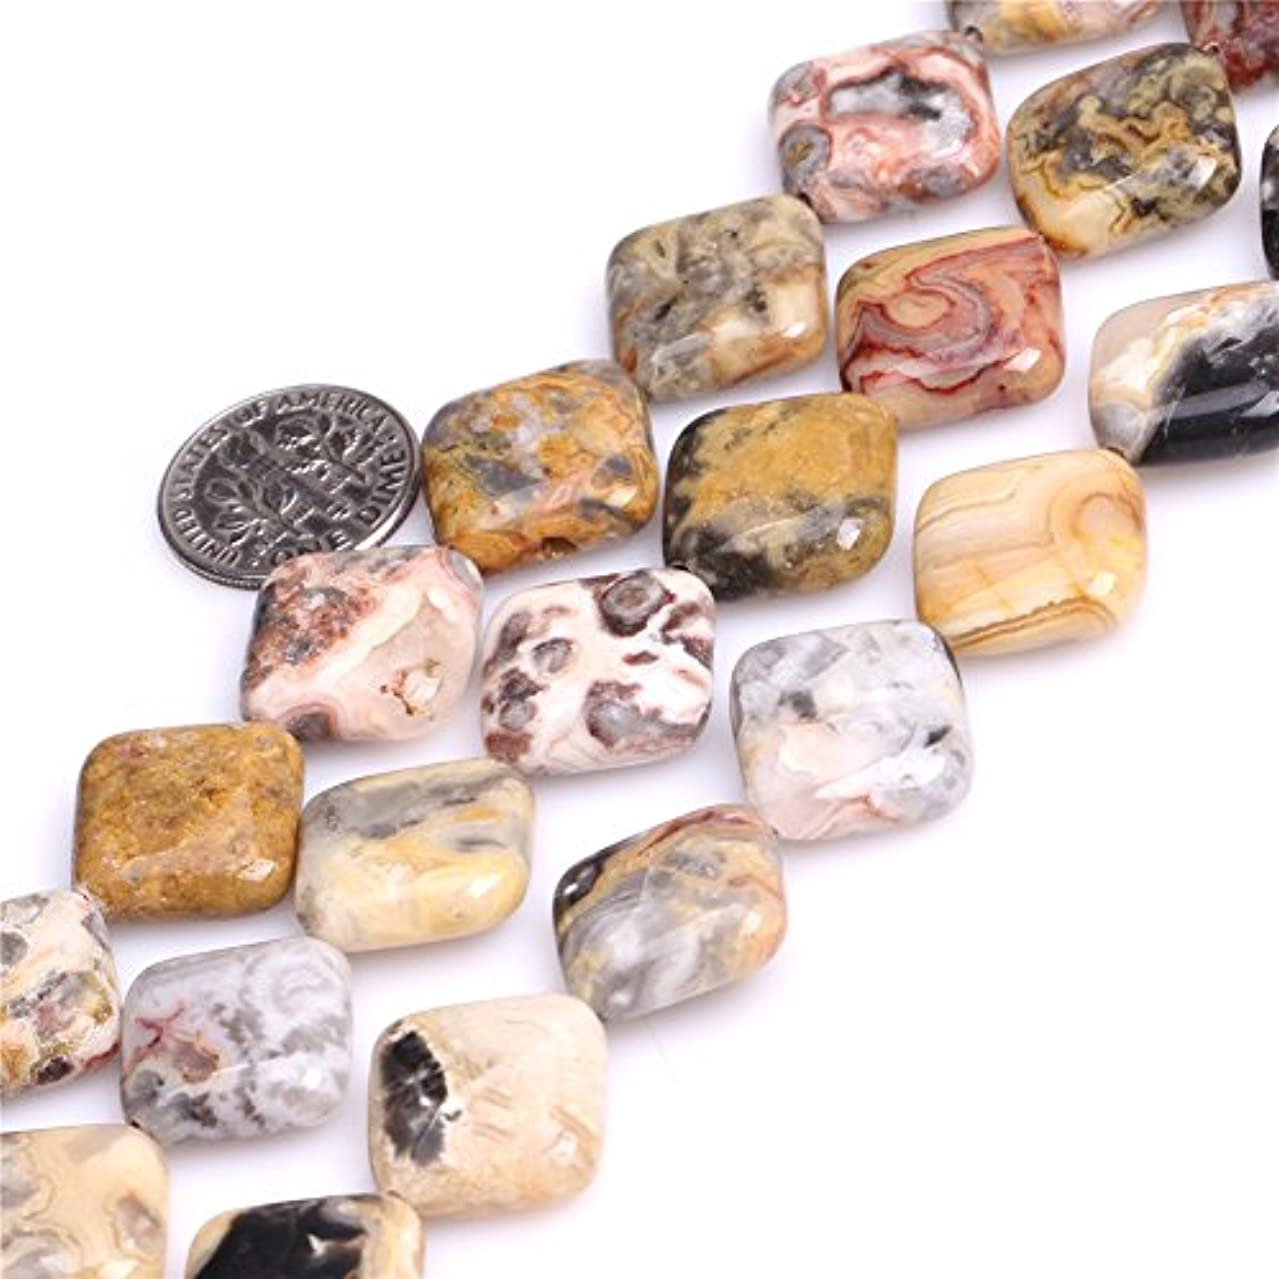 16mm Semi Precious Square Diagonally Crazy Agate Gemstone Beads for Jewelry Making Strand 15